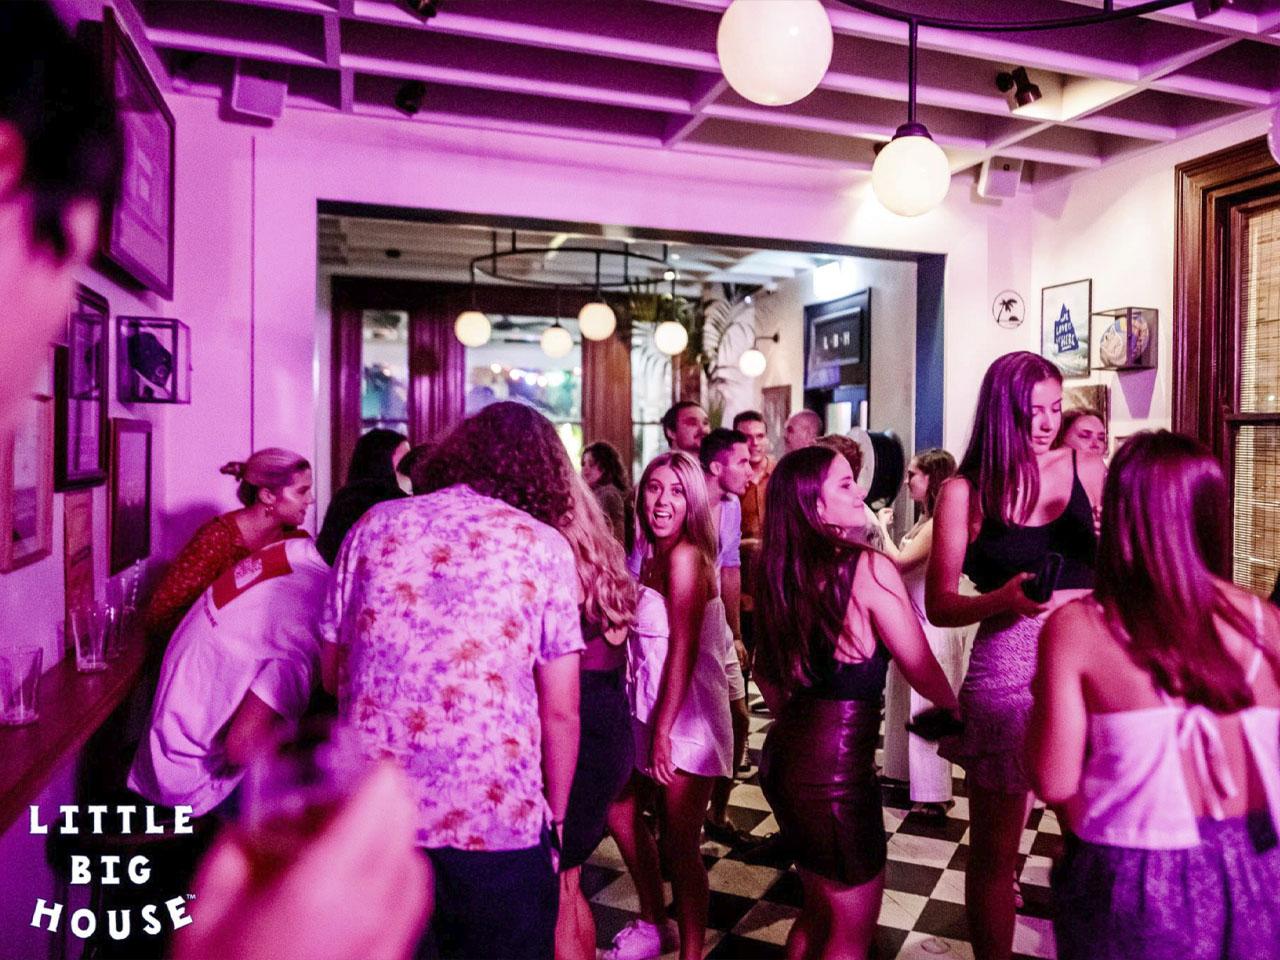 People on dance floor with purple haze lighting